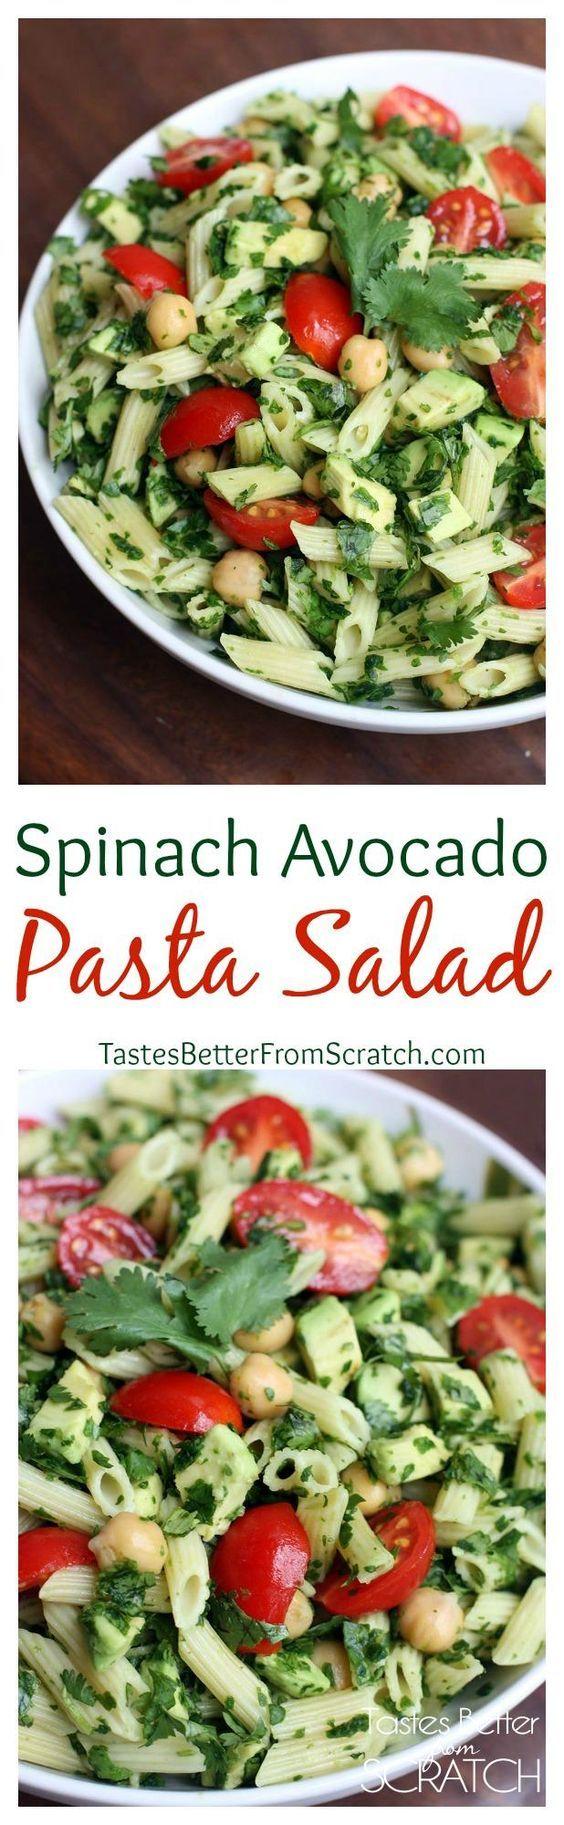 Spinach Avocado Pasta Salad on TastesBetterFromScratch.com